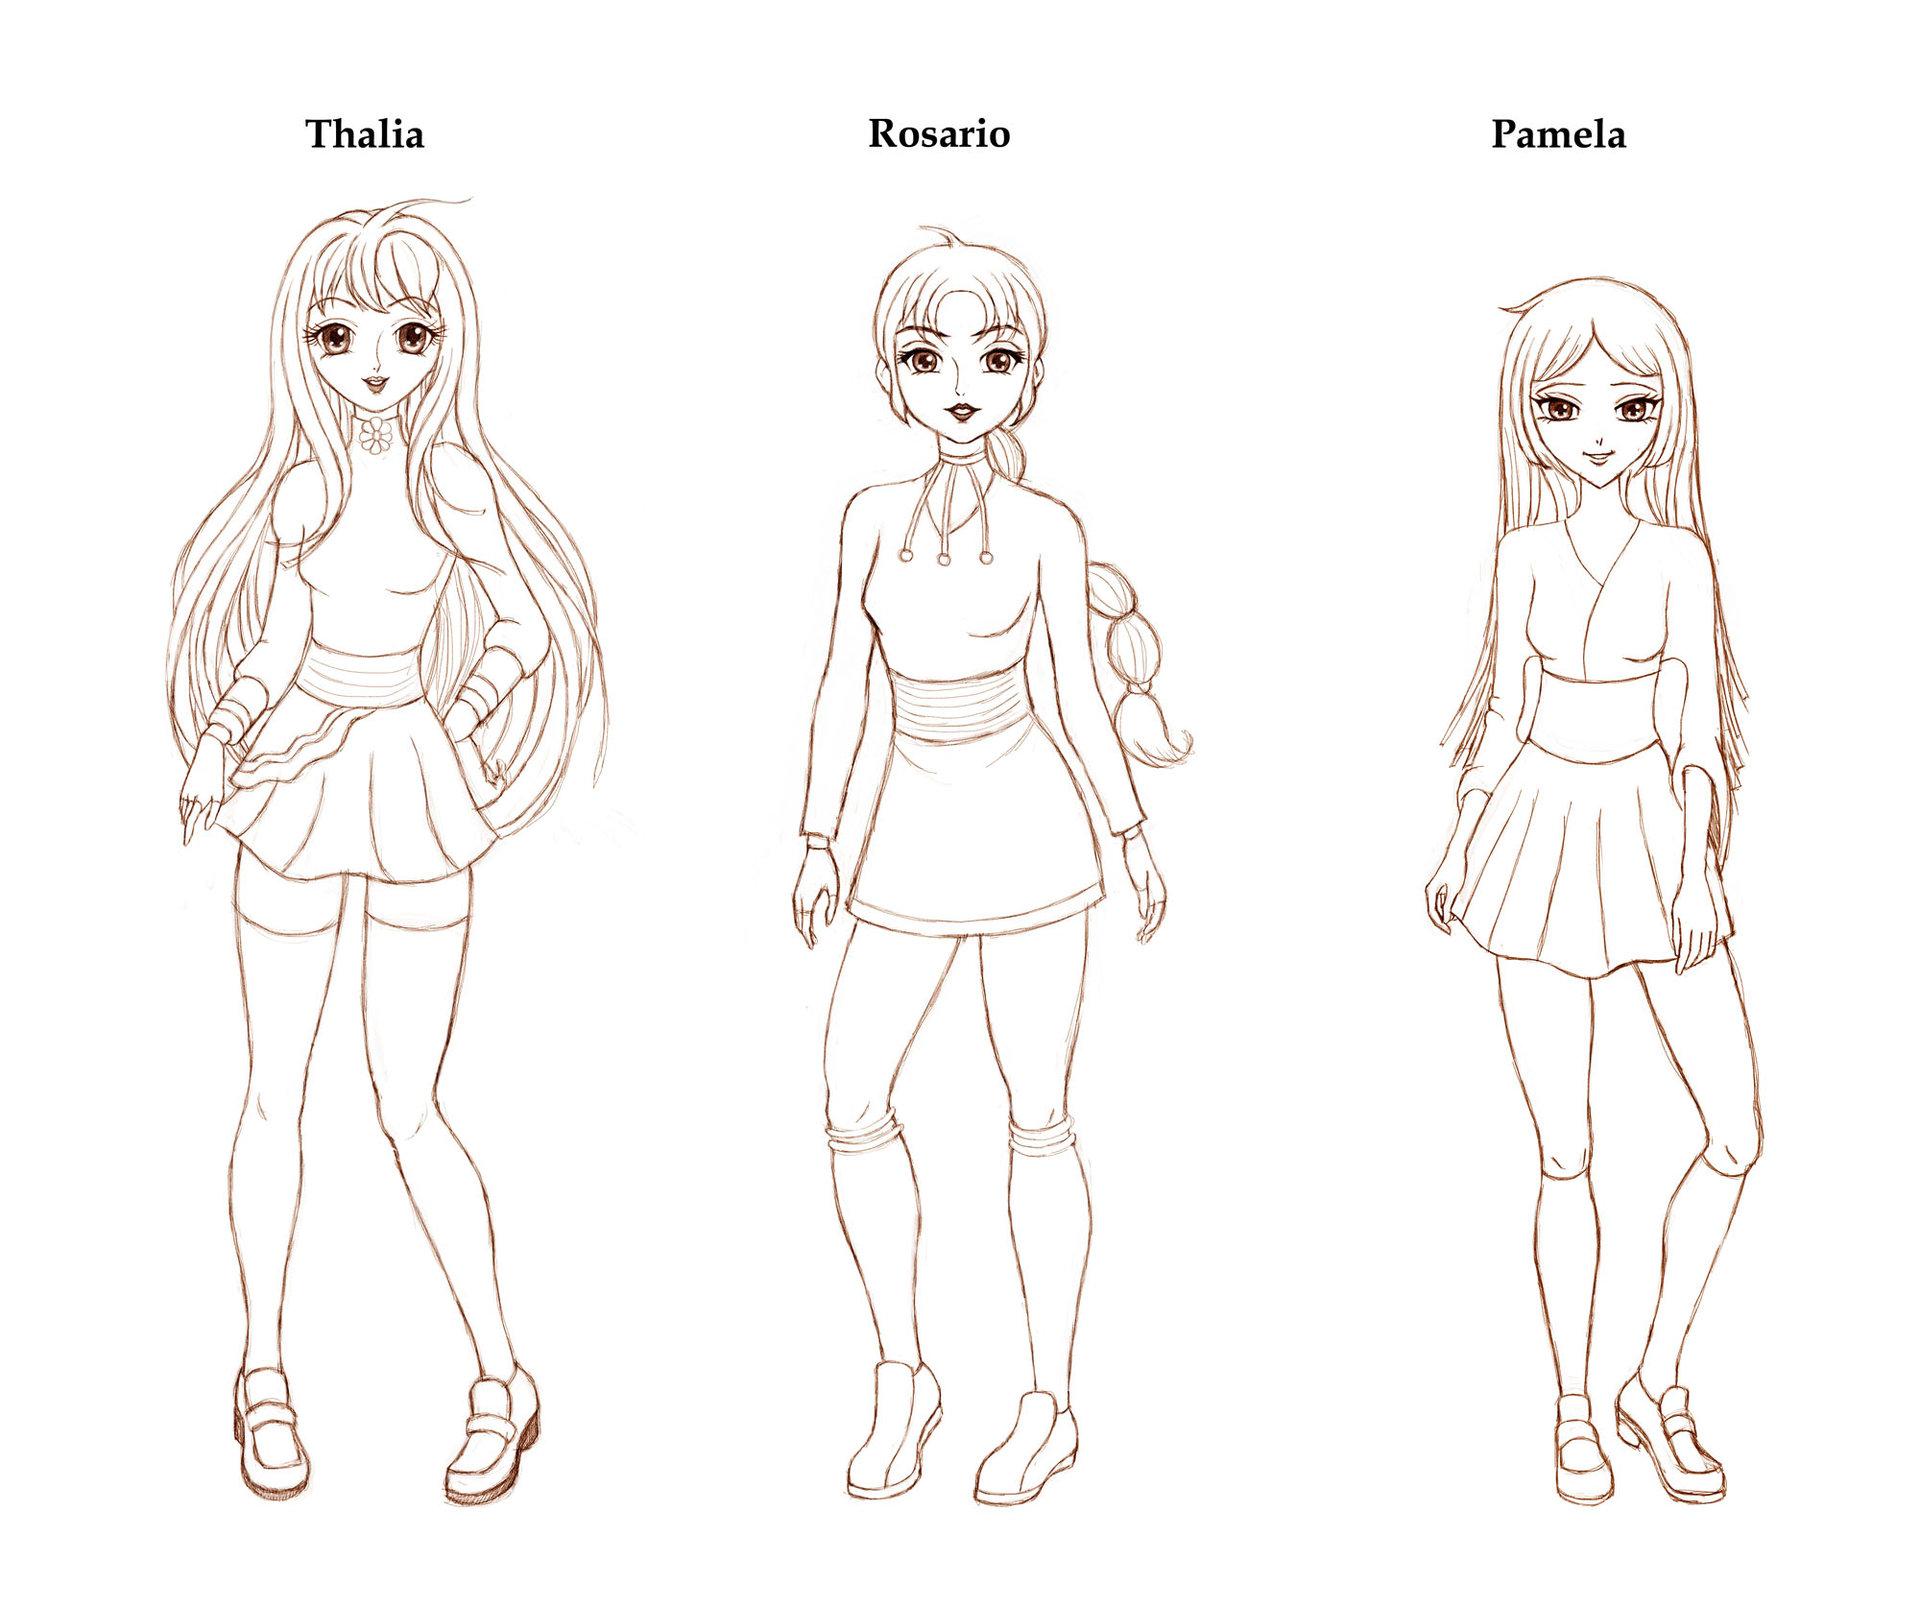 Patricia vasquez de velasco 3 personajes disenos previos 001